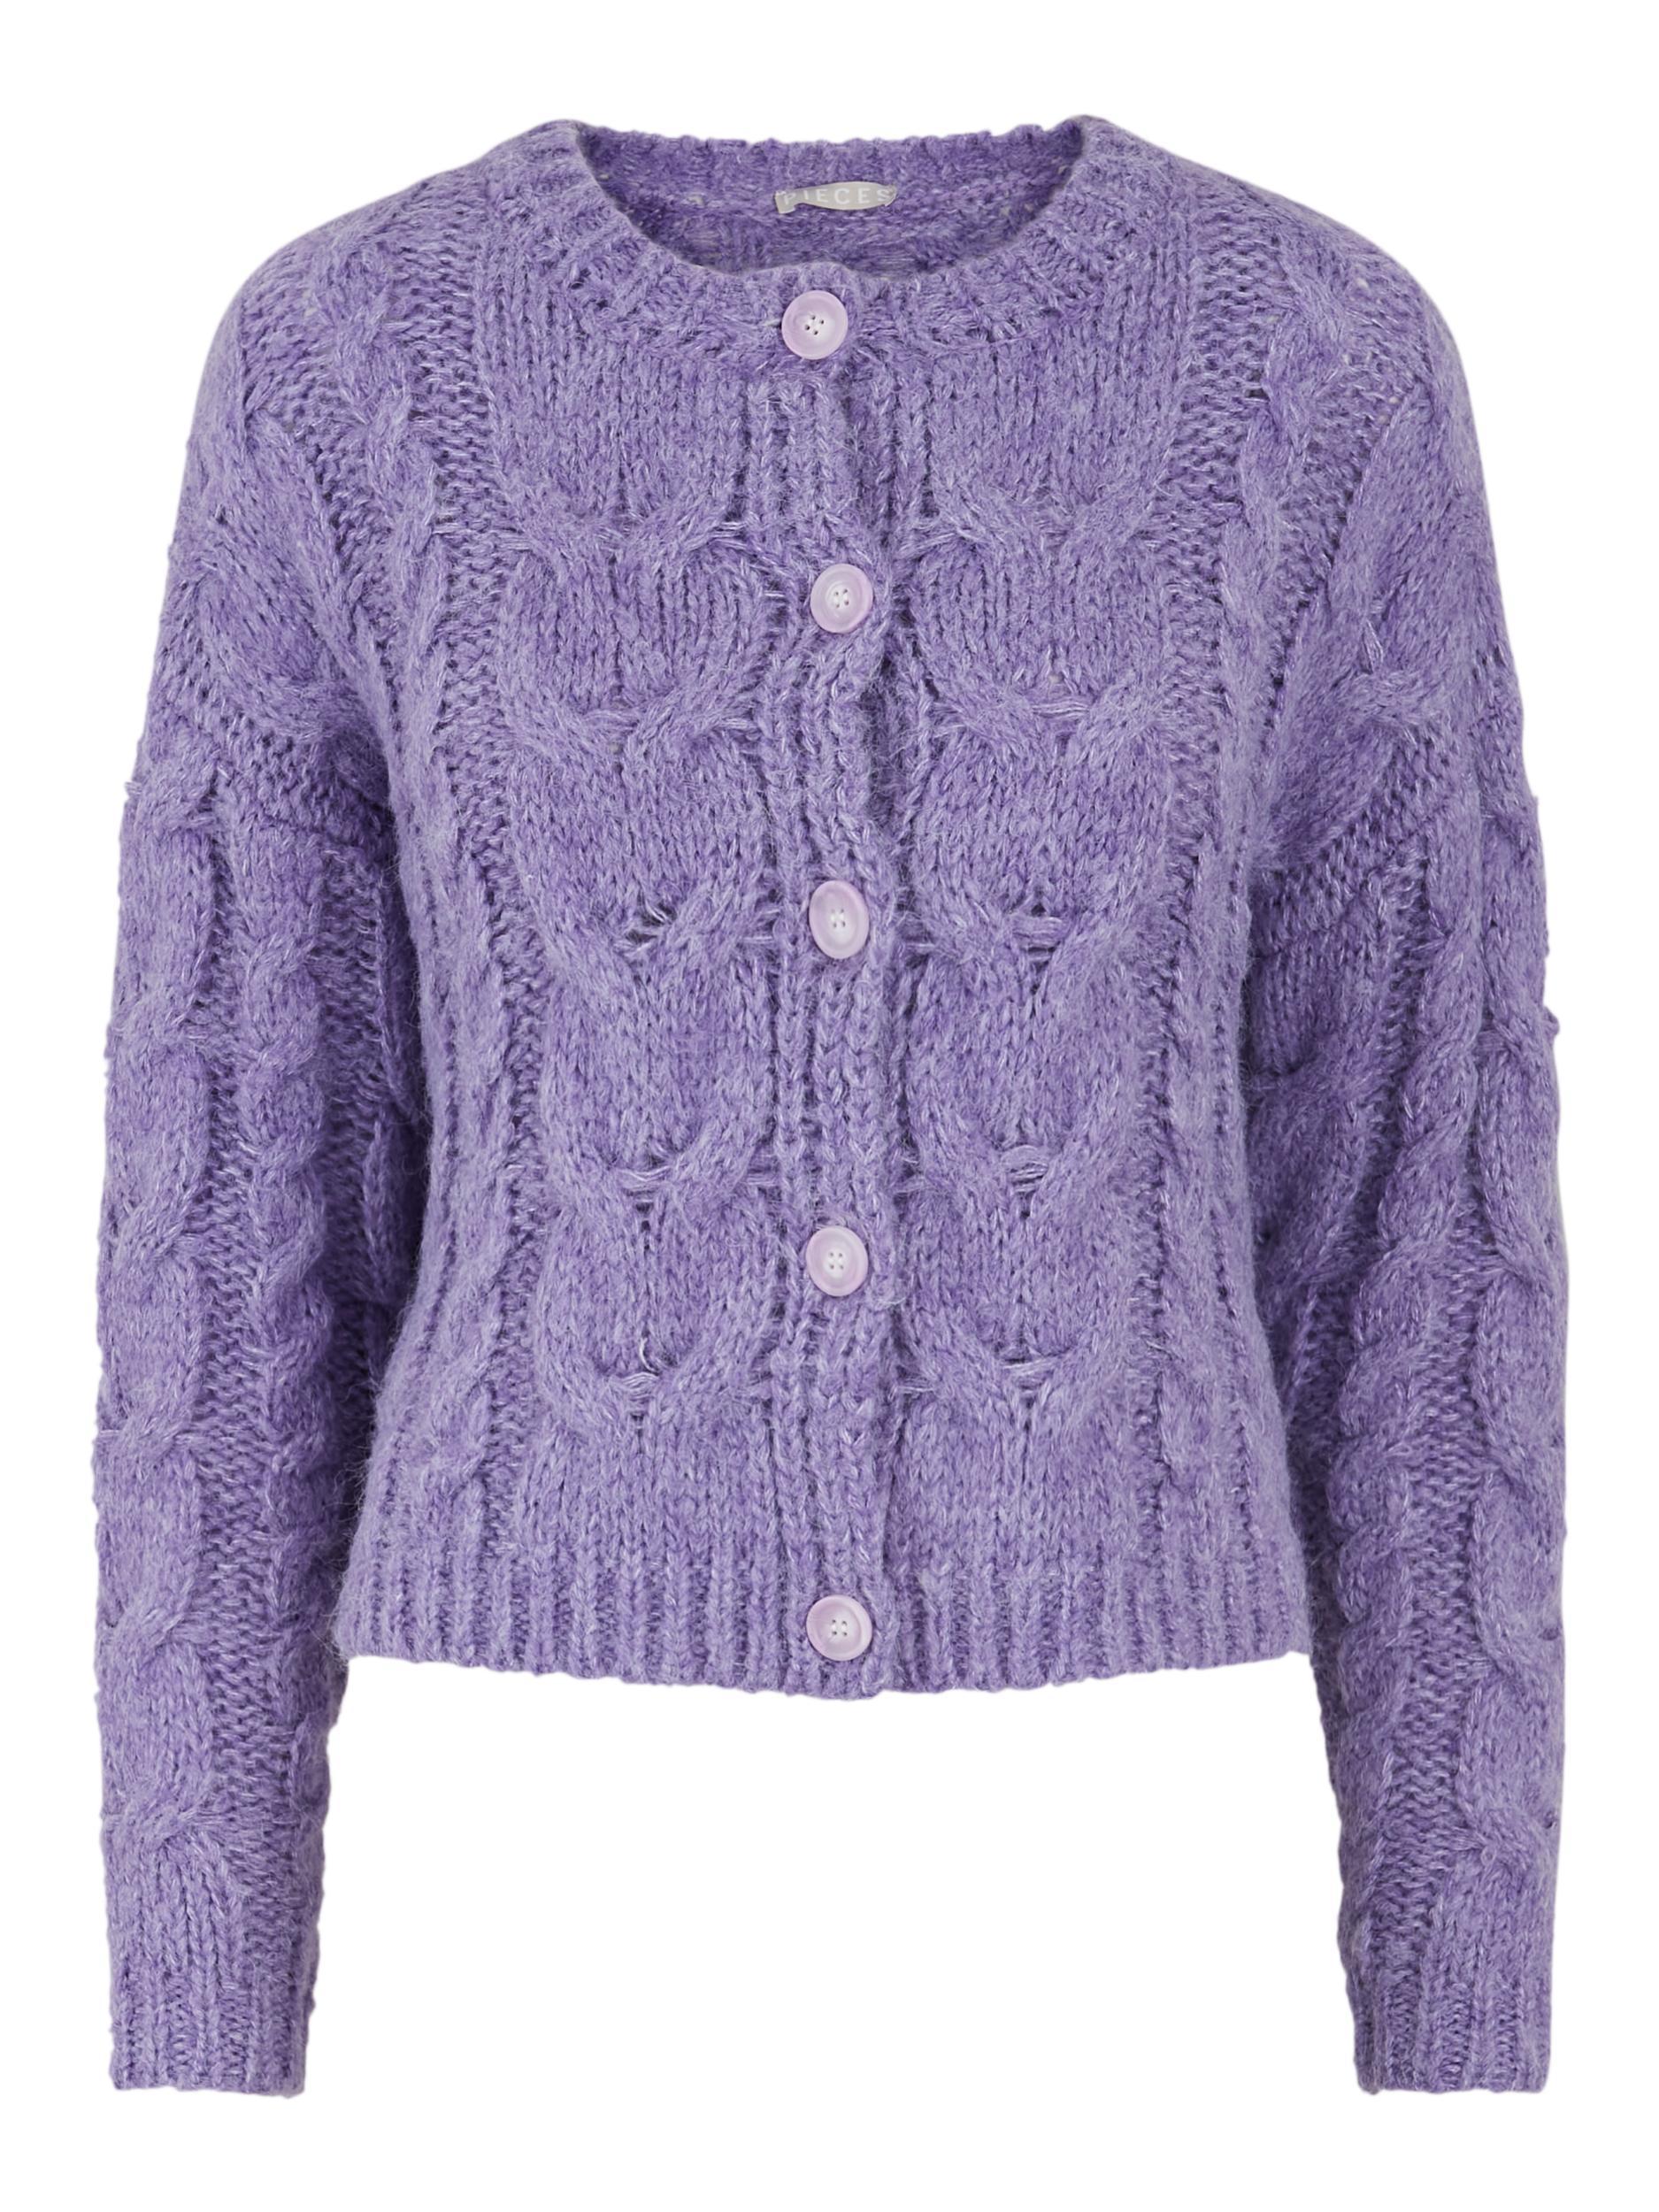 Pieces Fittal LS cardigan, dahlia purple, small